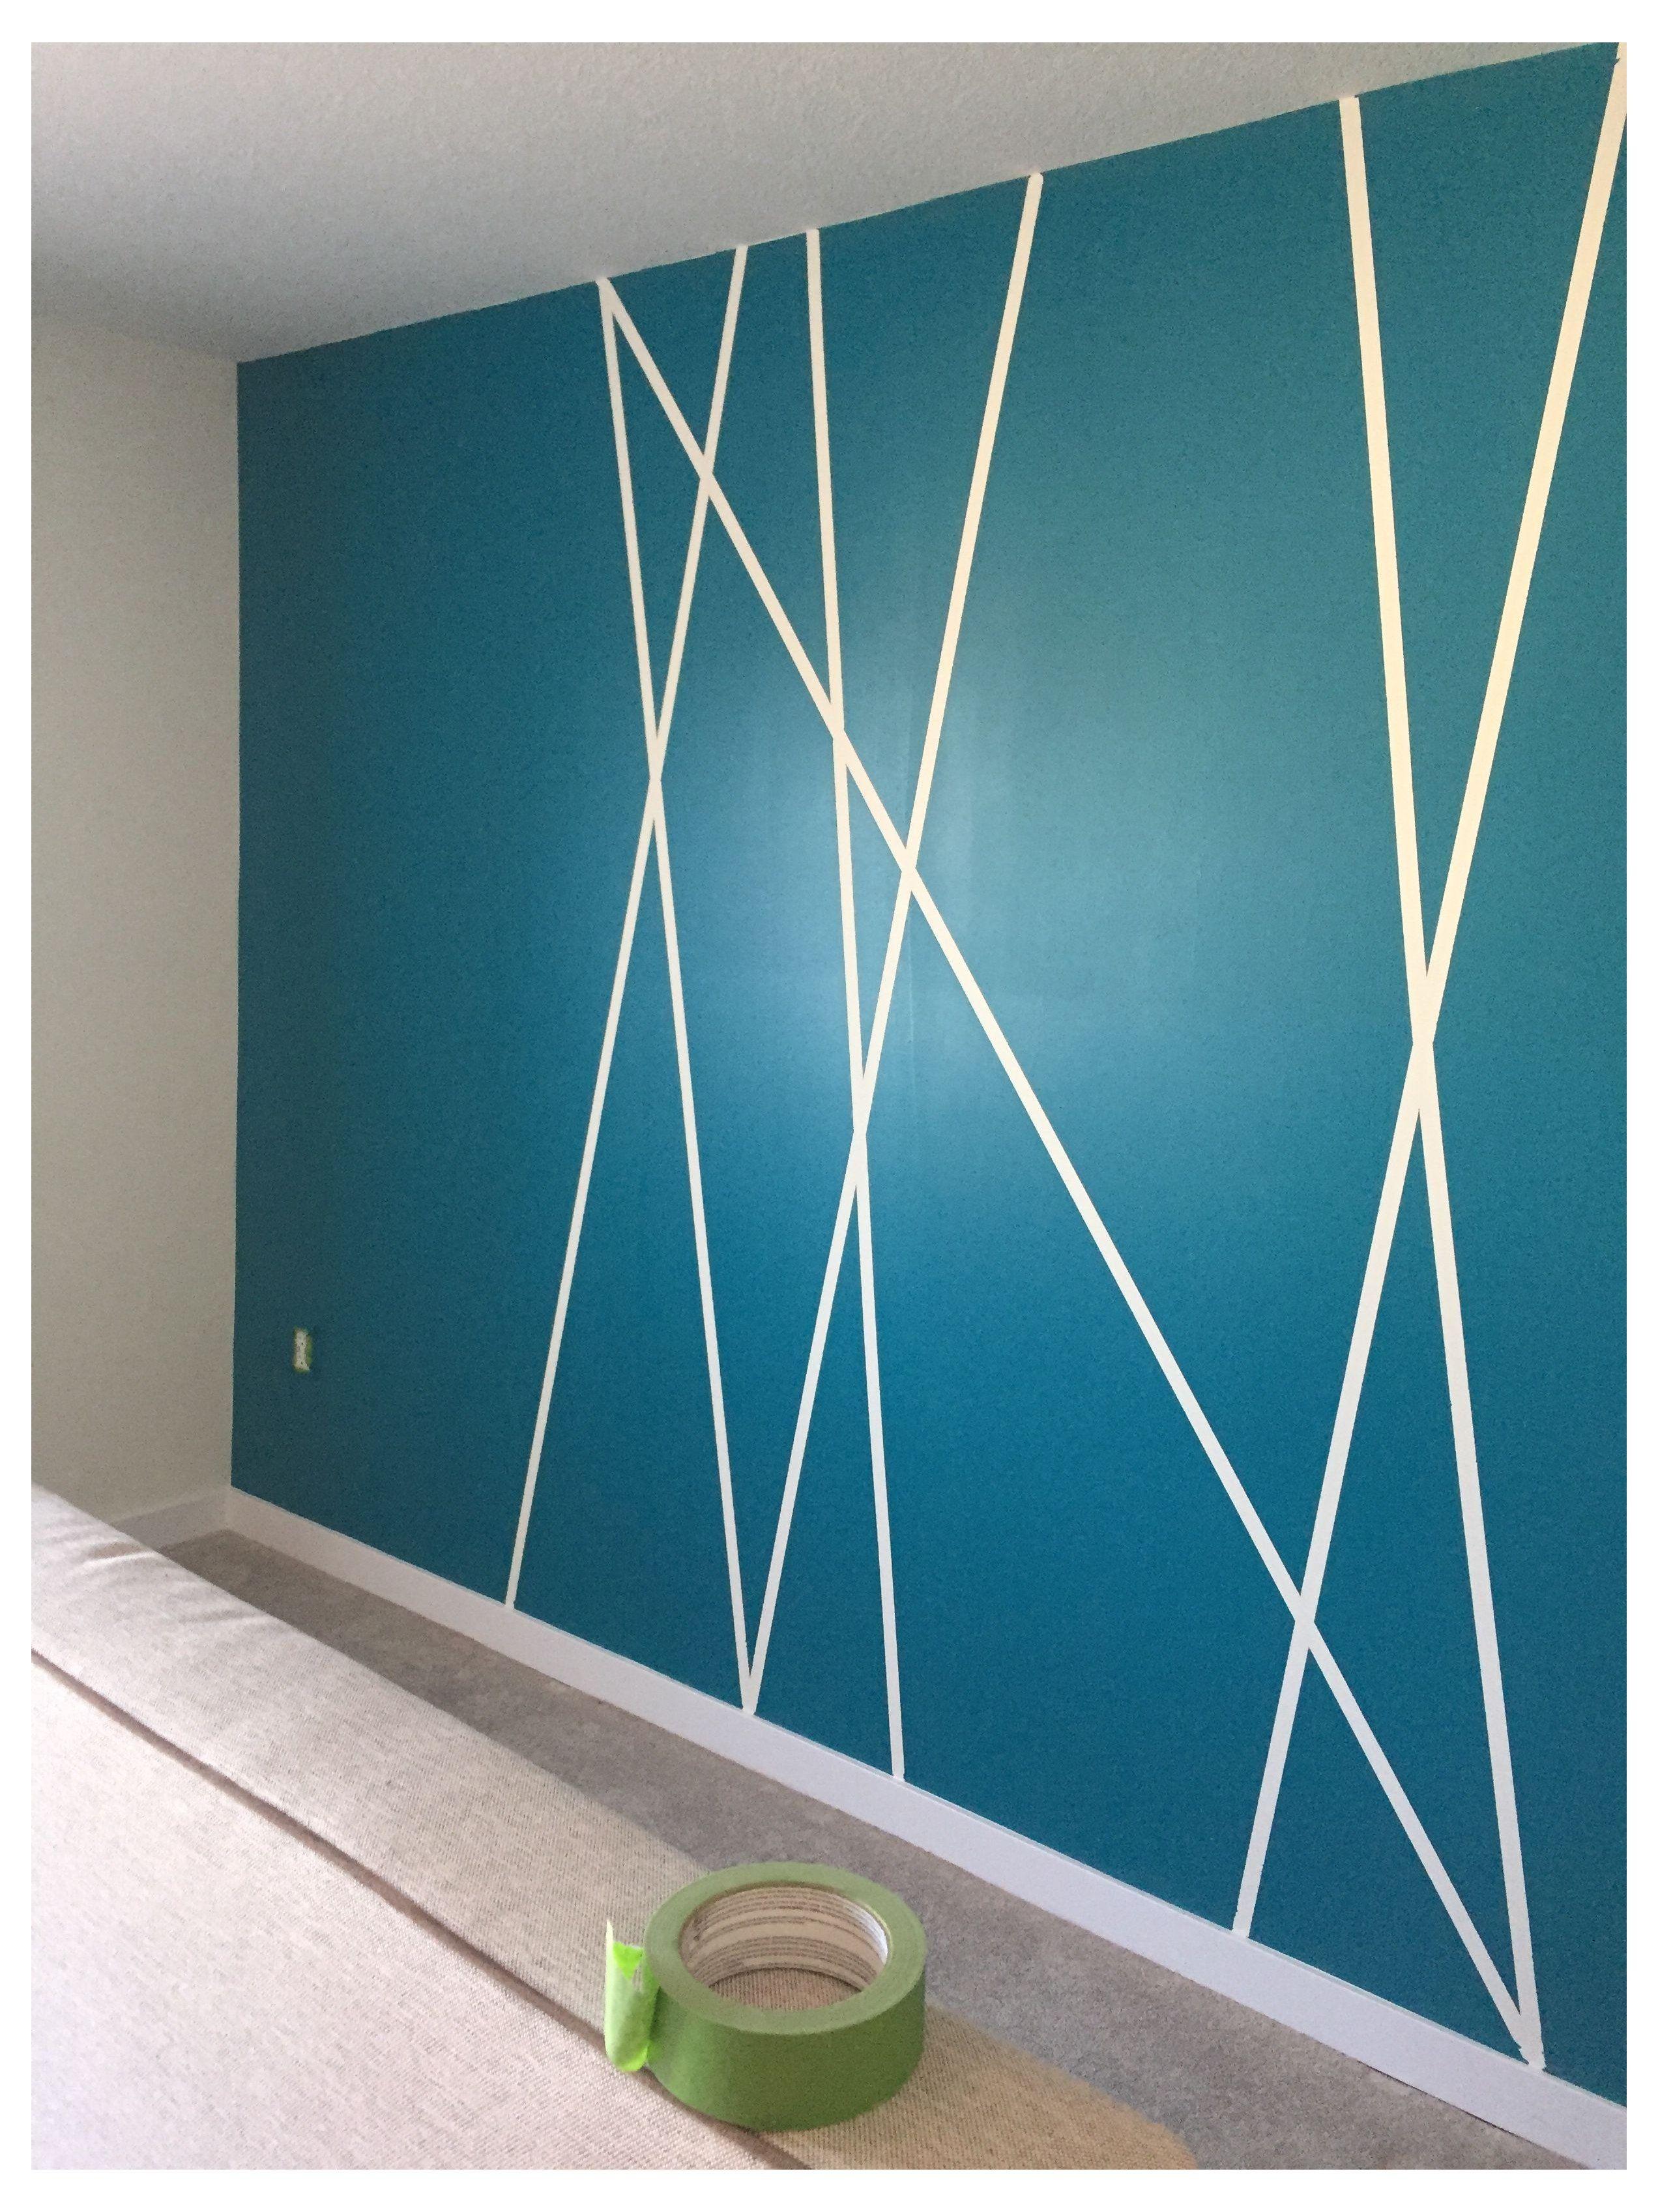 Geometric Wall Art Diy Painters Tape Geometricwallartdiypainterstape Diy Accent Wall Using Pa Wall Paint Designs Geometric Wall Paint Bedroom Wall Paint